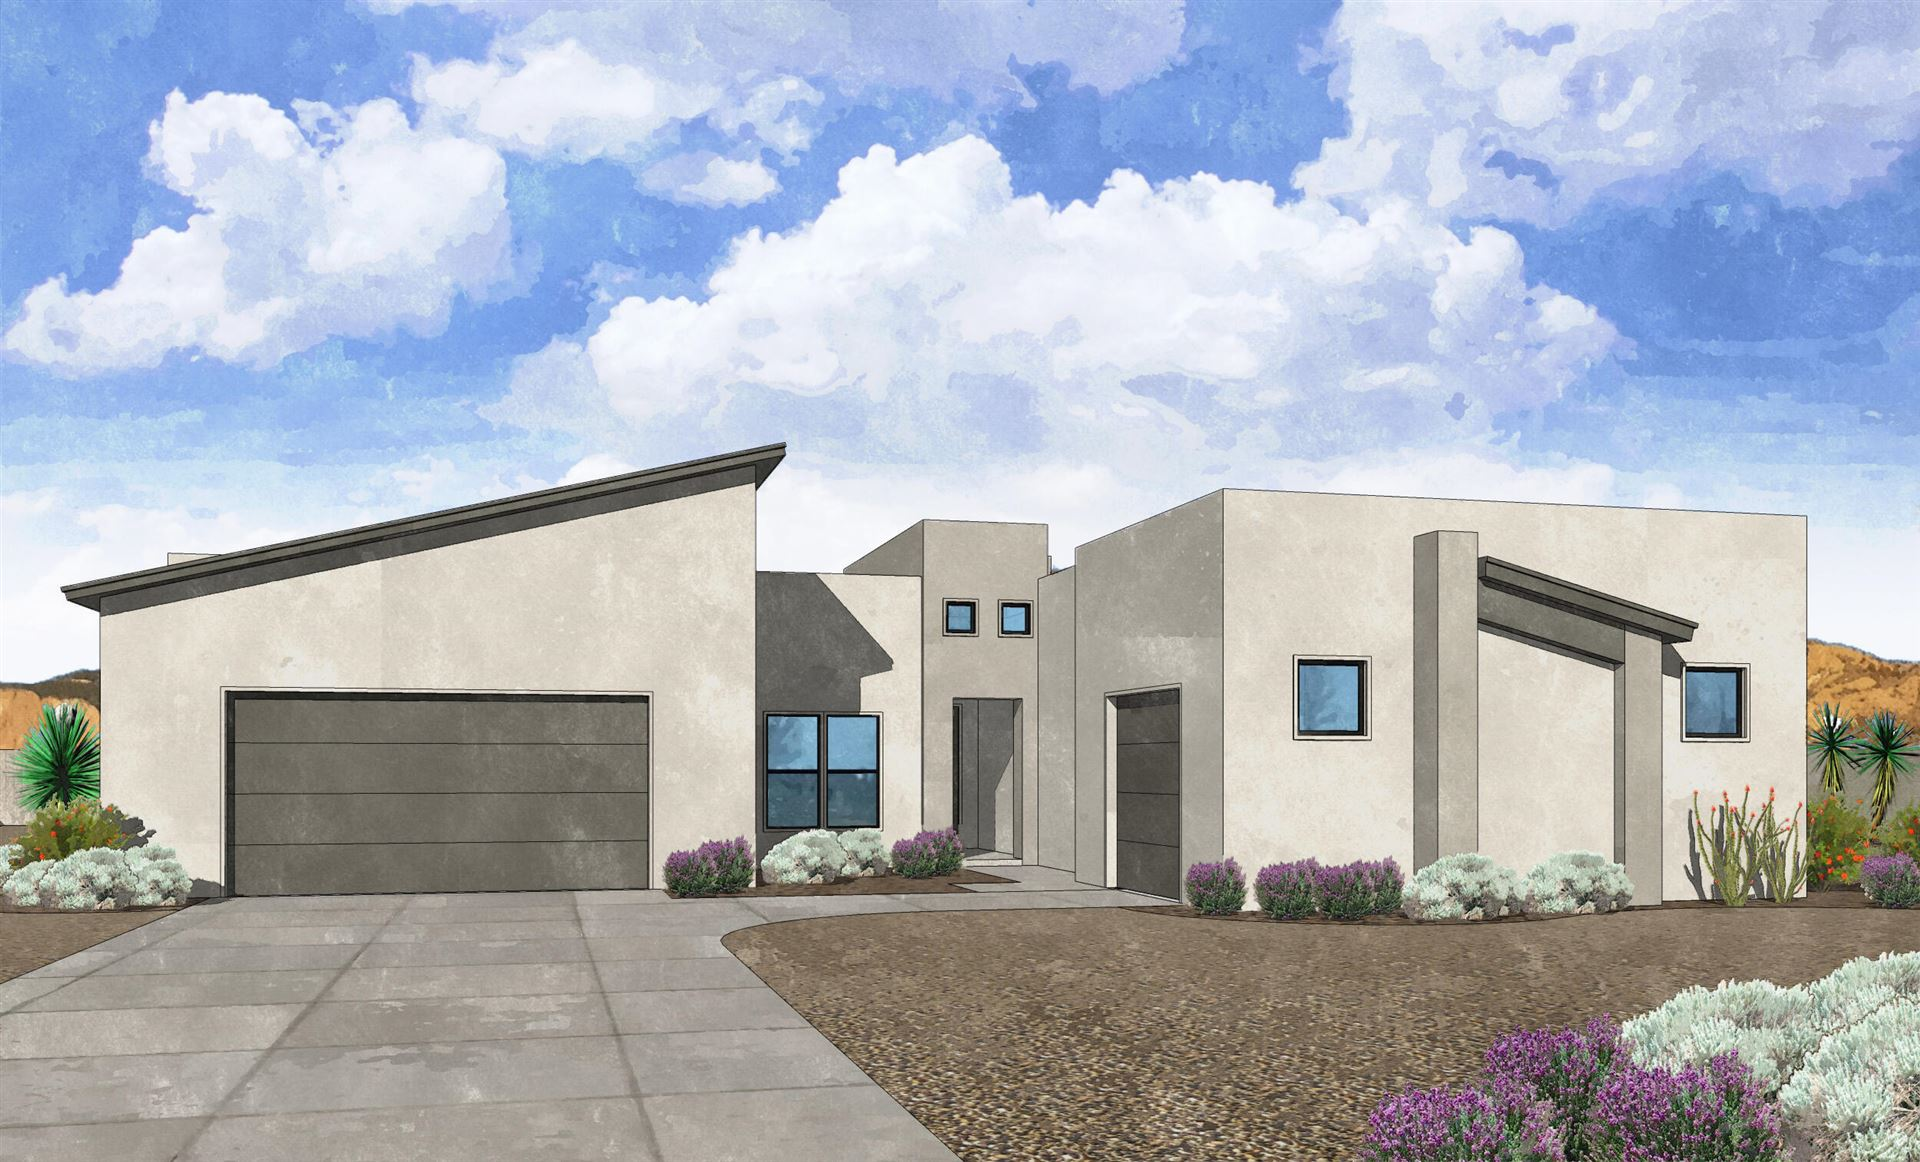 6317 NACELLE Road NE, Rio Rancho, NM 87144 - MLS#: 989378